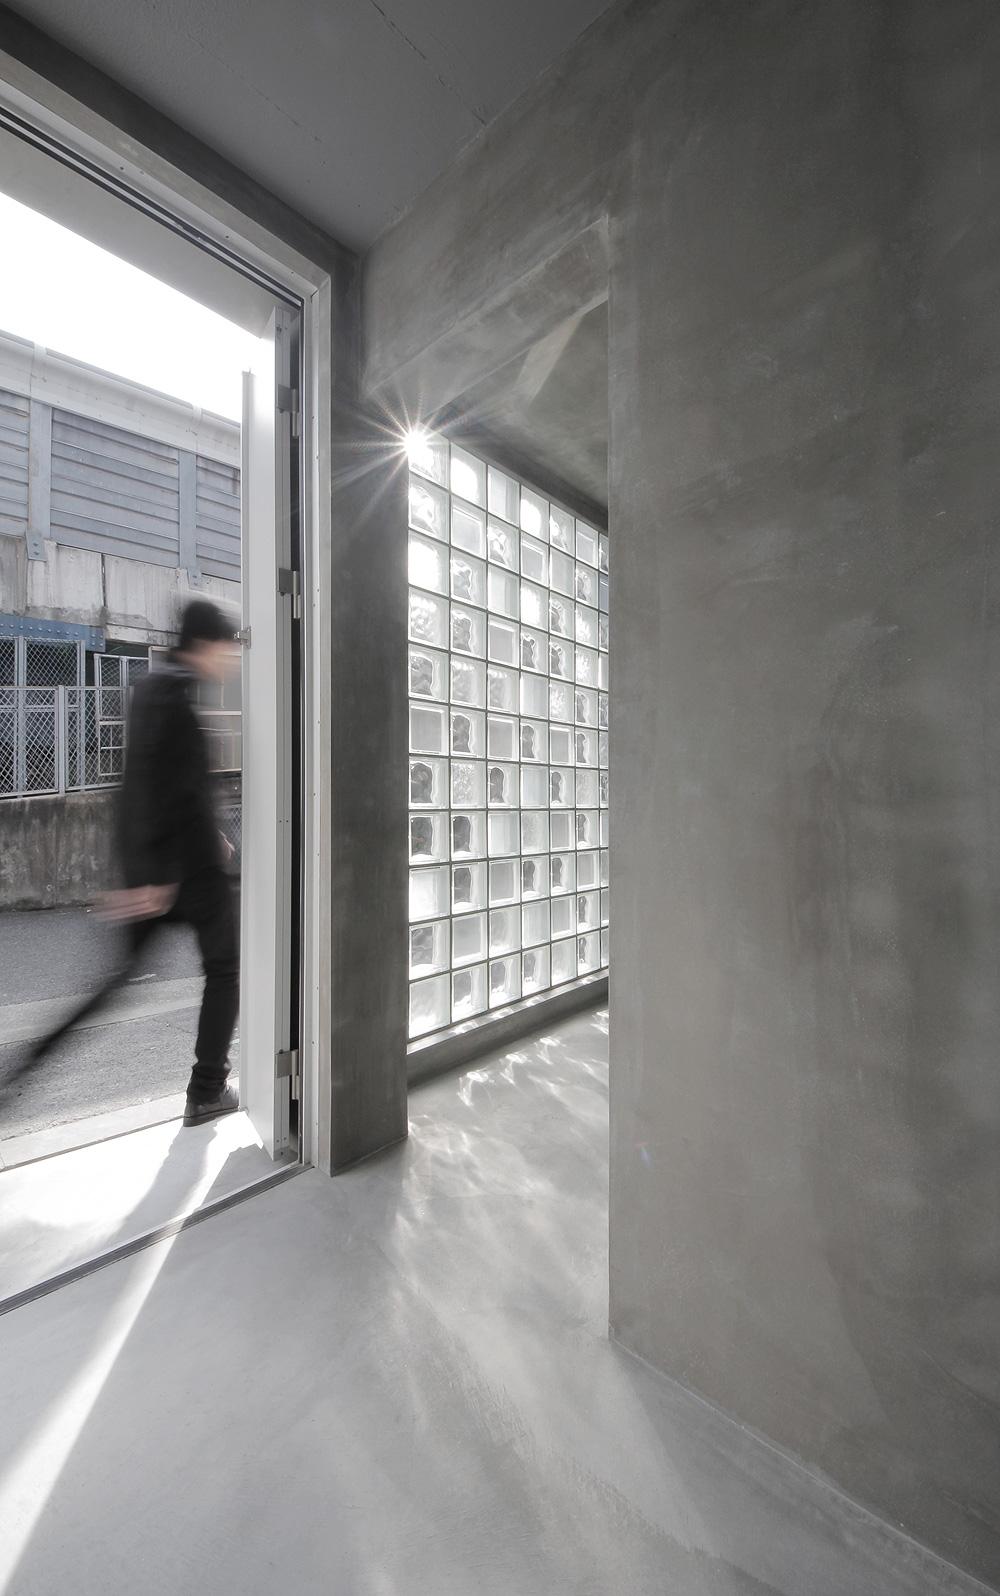 vivienda y galeria de arte jun murata (6)